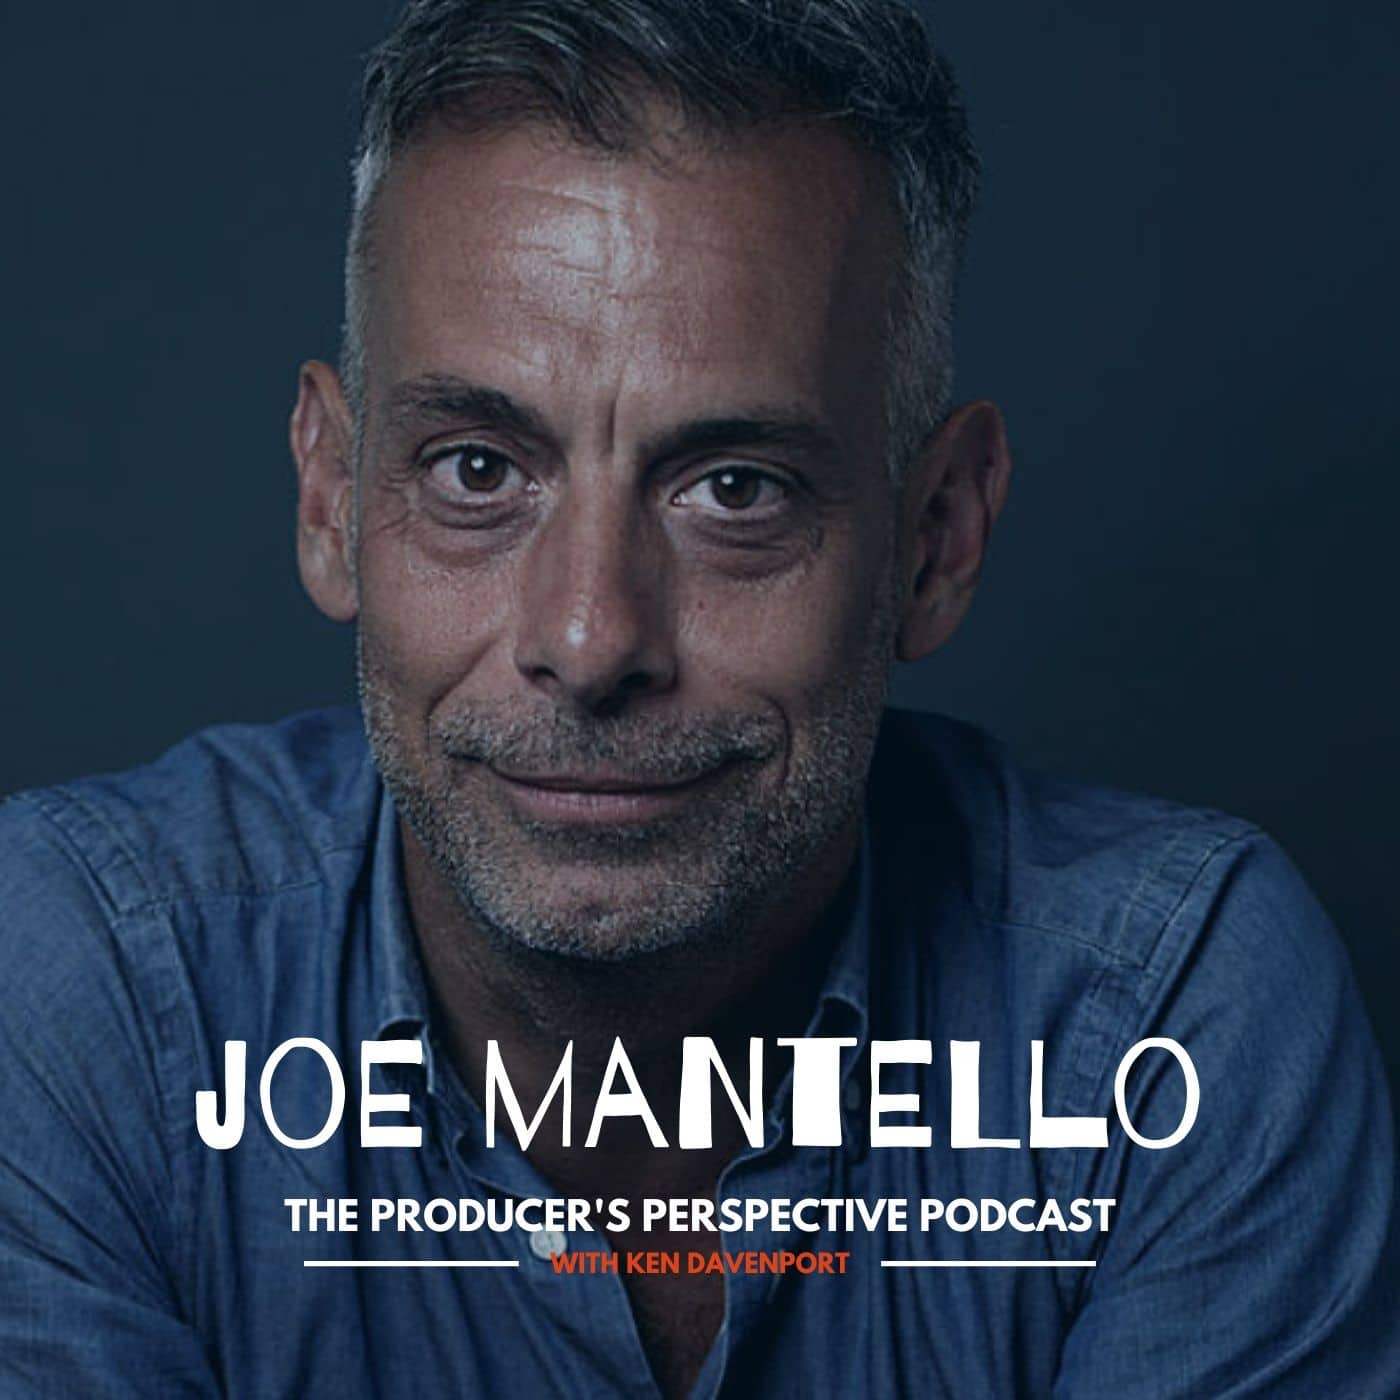 Ken Davenport's The Producer's Perspective Podcast Episode 50 - Joe Maniello